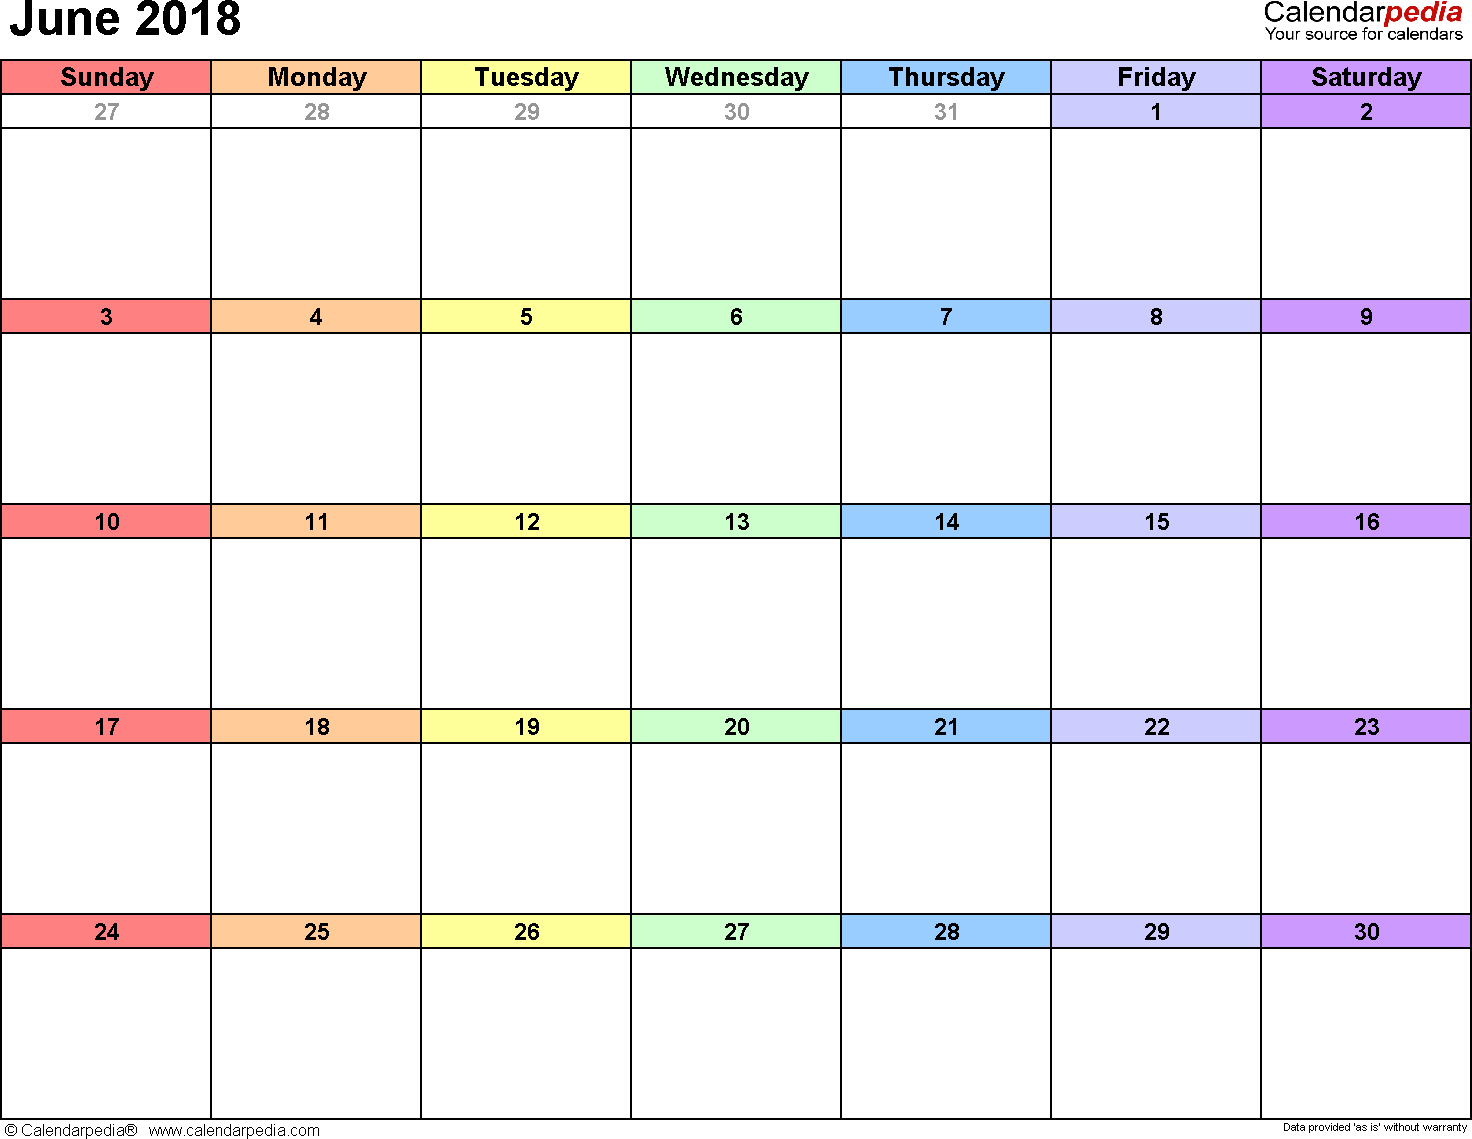 004 Business Plan Calendar Template Excellent Templates Planner for Calendar Template With 194 Days